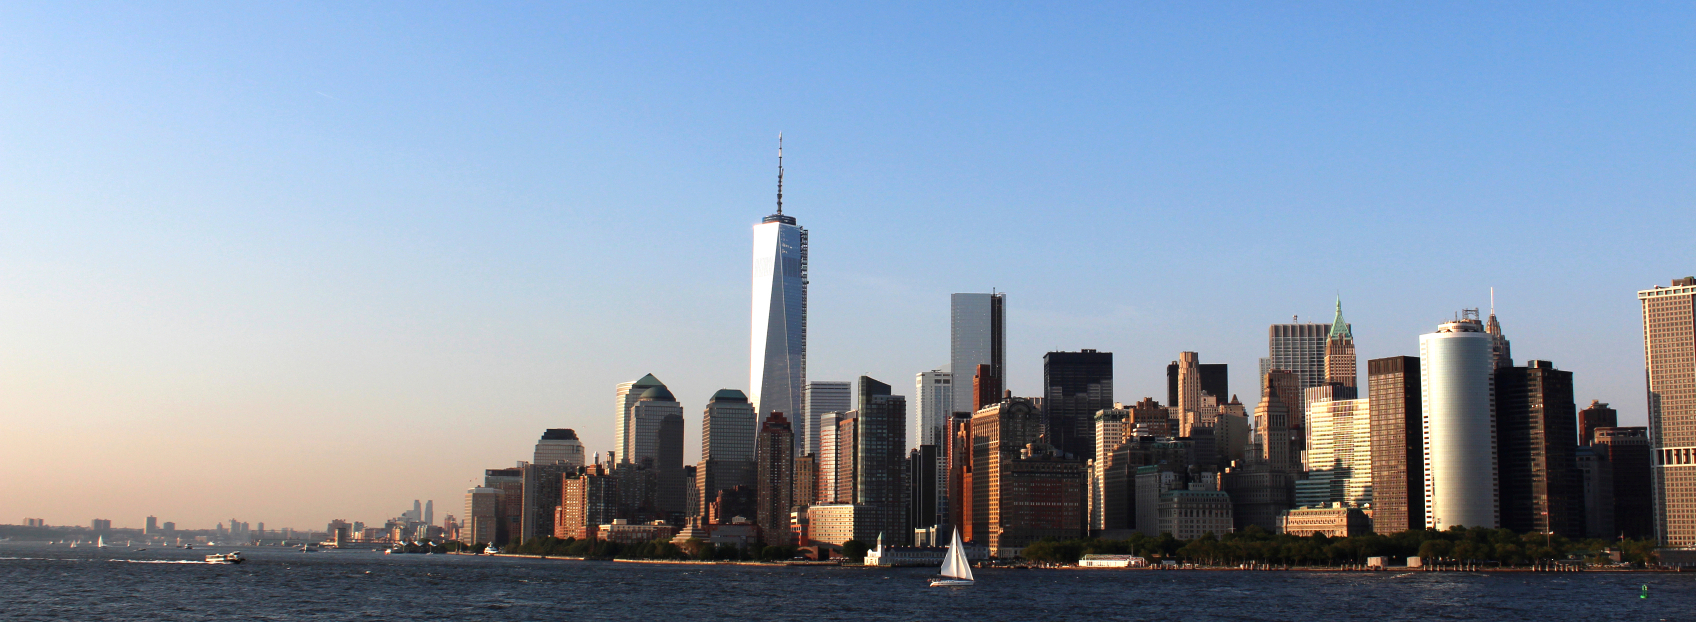 Wine box feat. NEW YORK Skyline